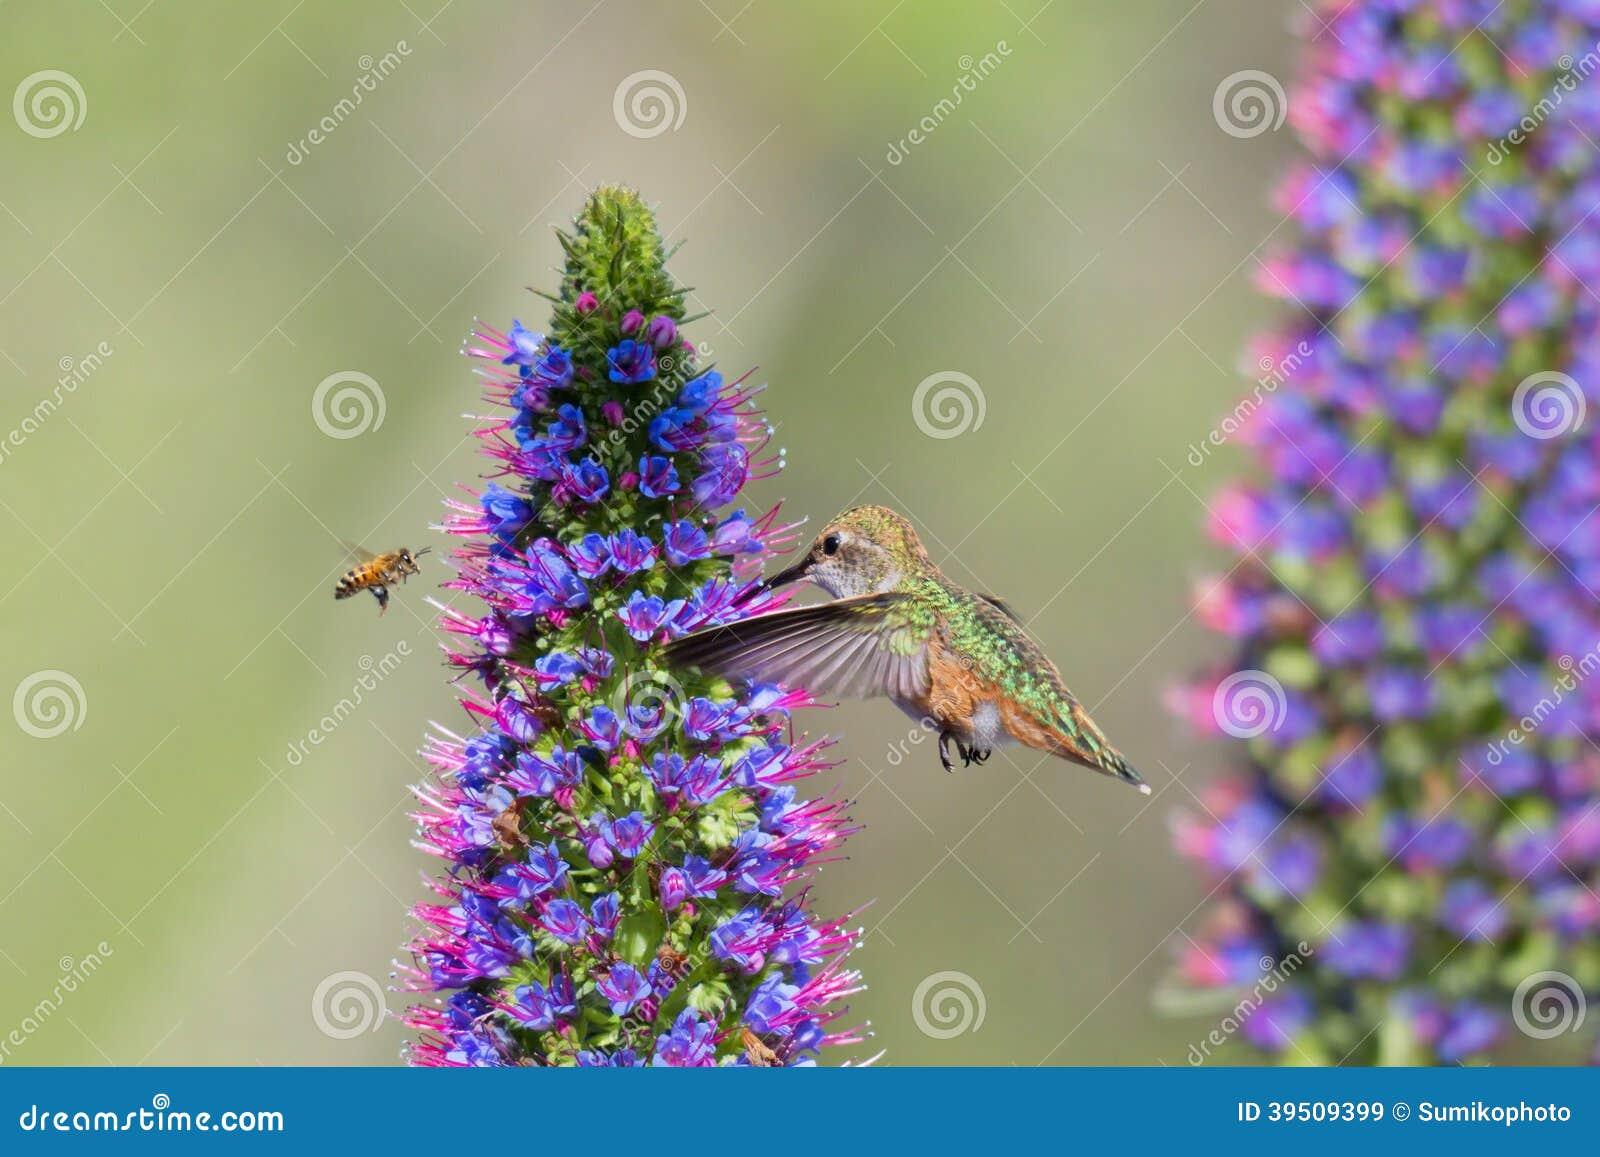 Hummingbird and Honey Bee